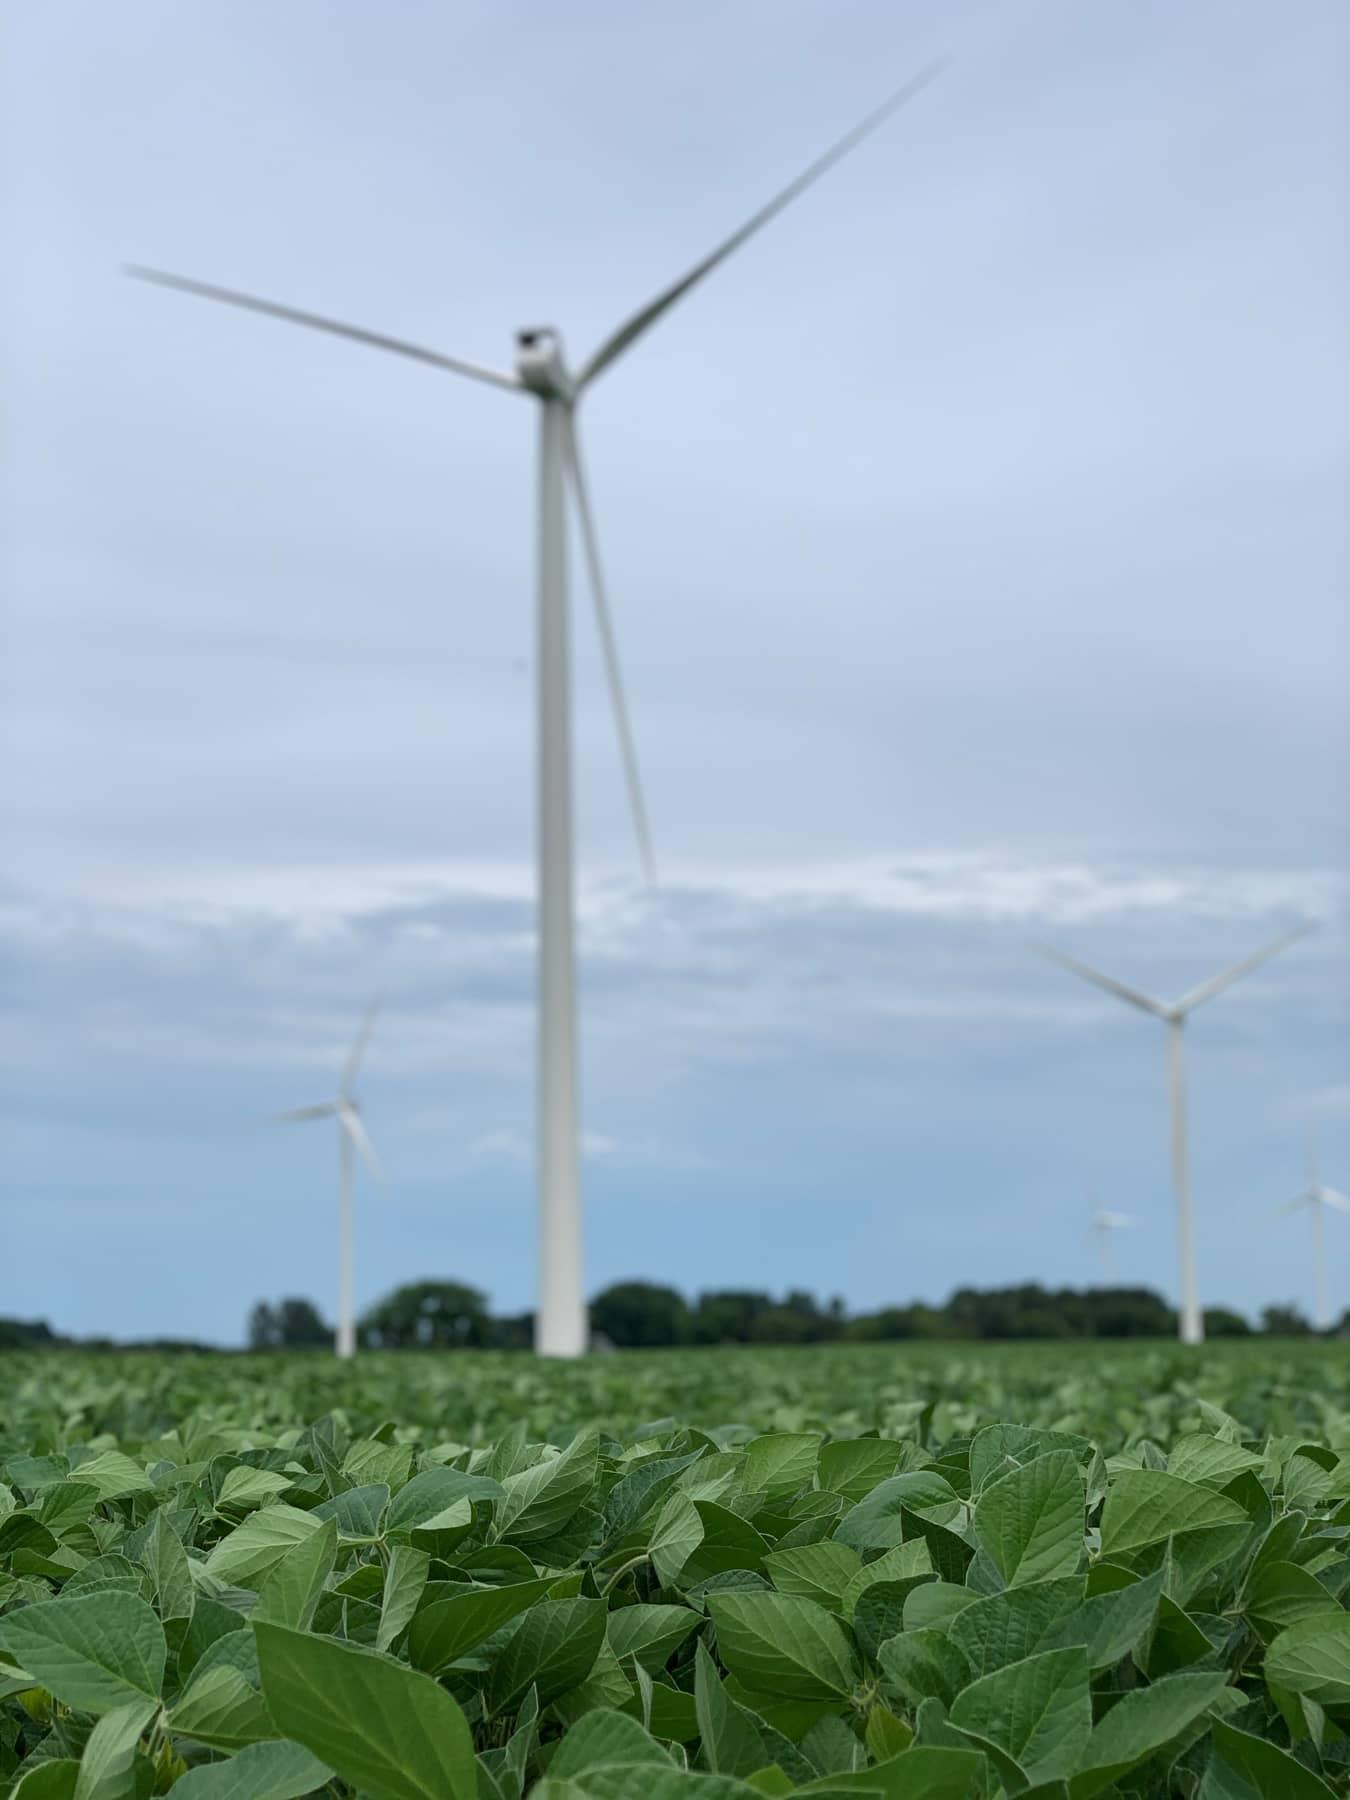 field and wind turbine